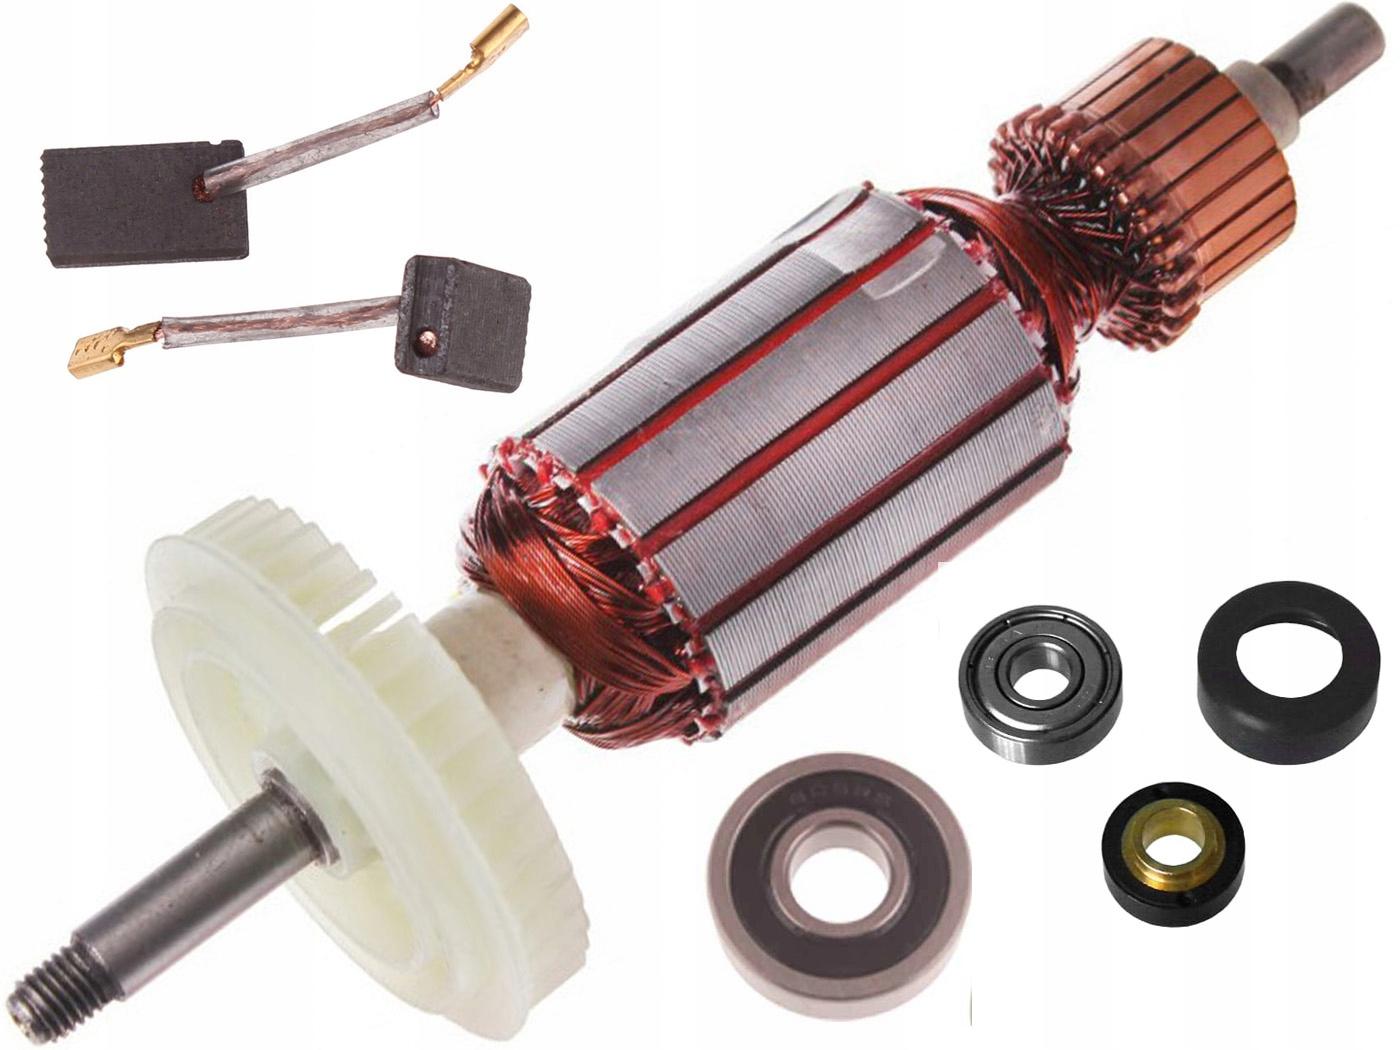 Rotor Hilti DSG125S, DSG125SE, DAG, 125 S, 125 DAG